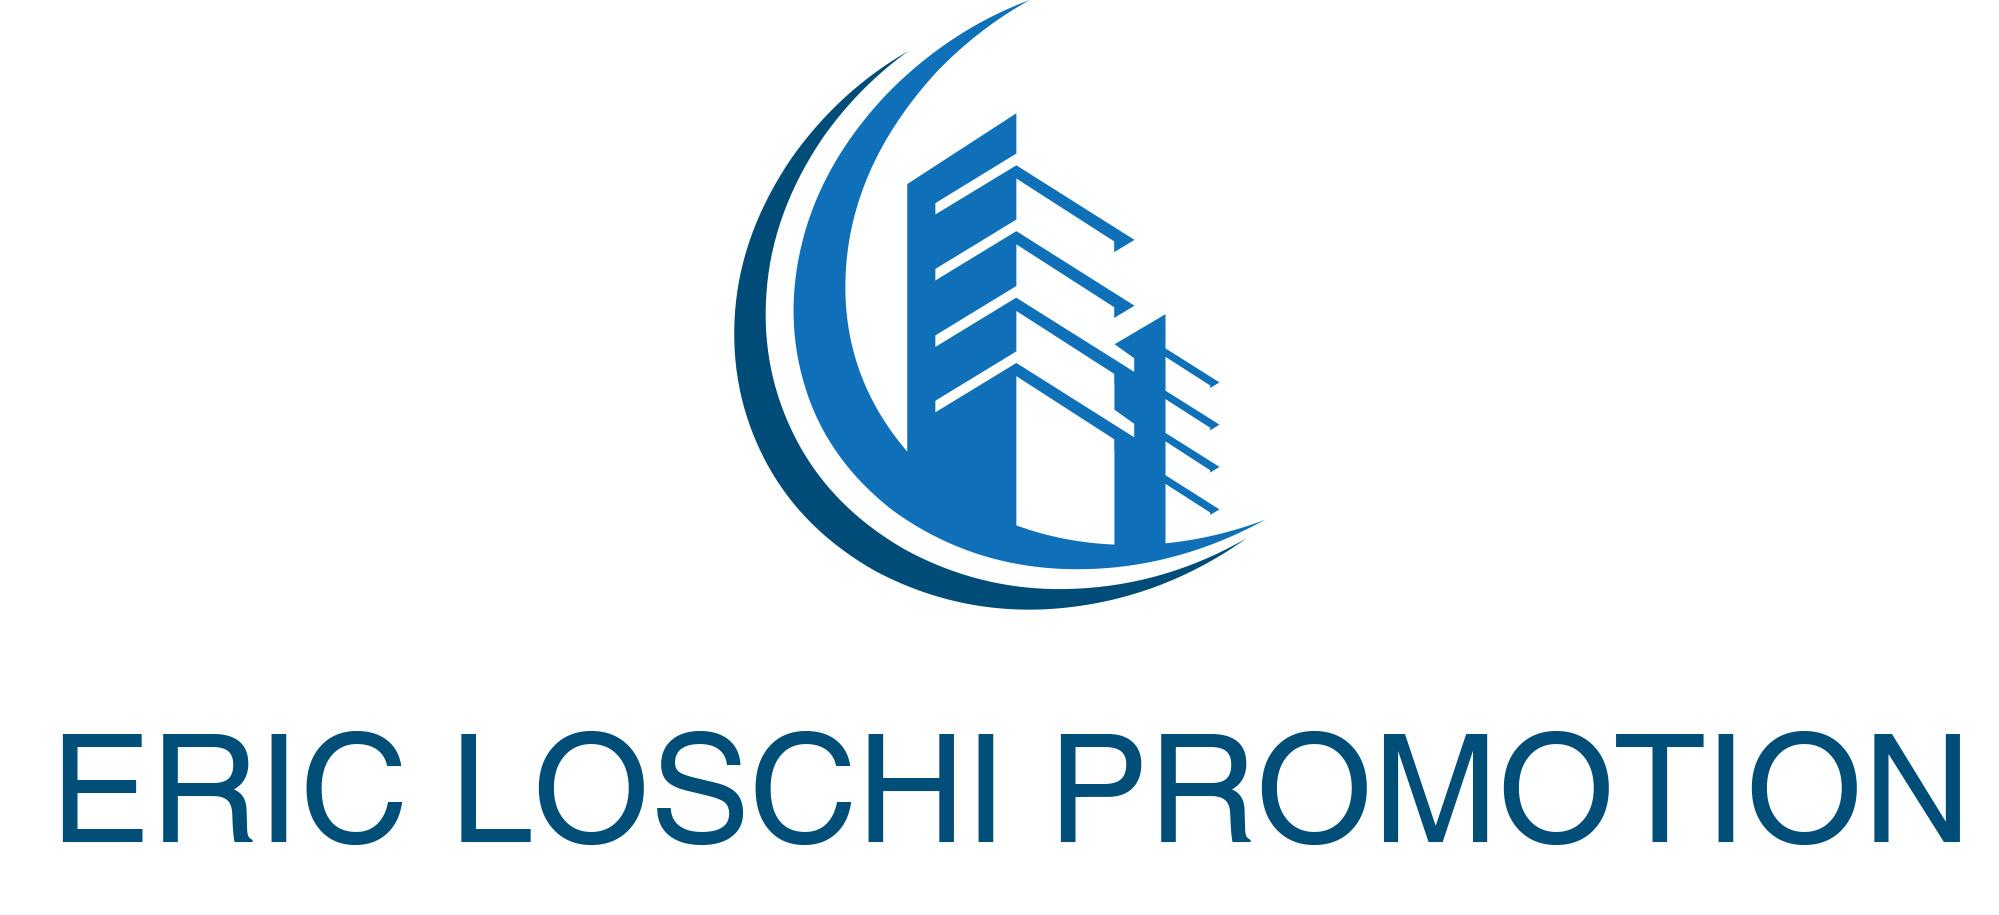 LOSCHI PROMOTION a financé 2 projet$s grâce au crowdfunding